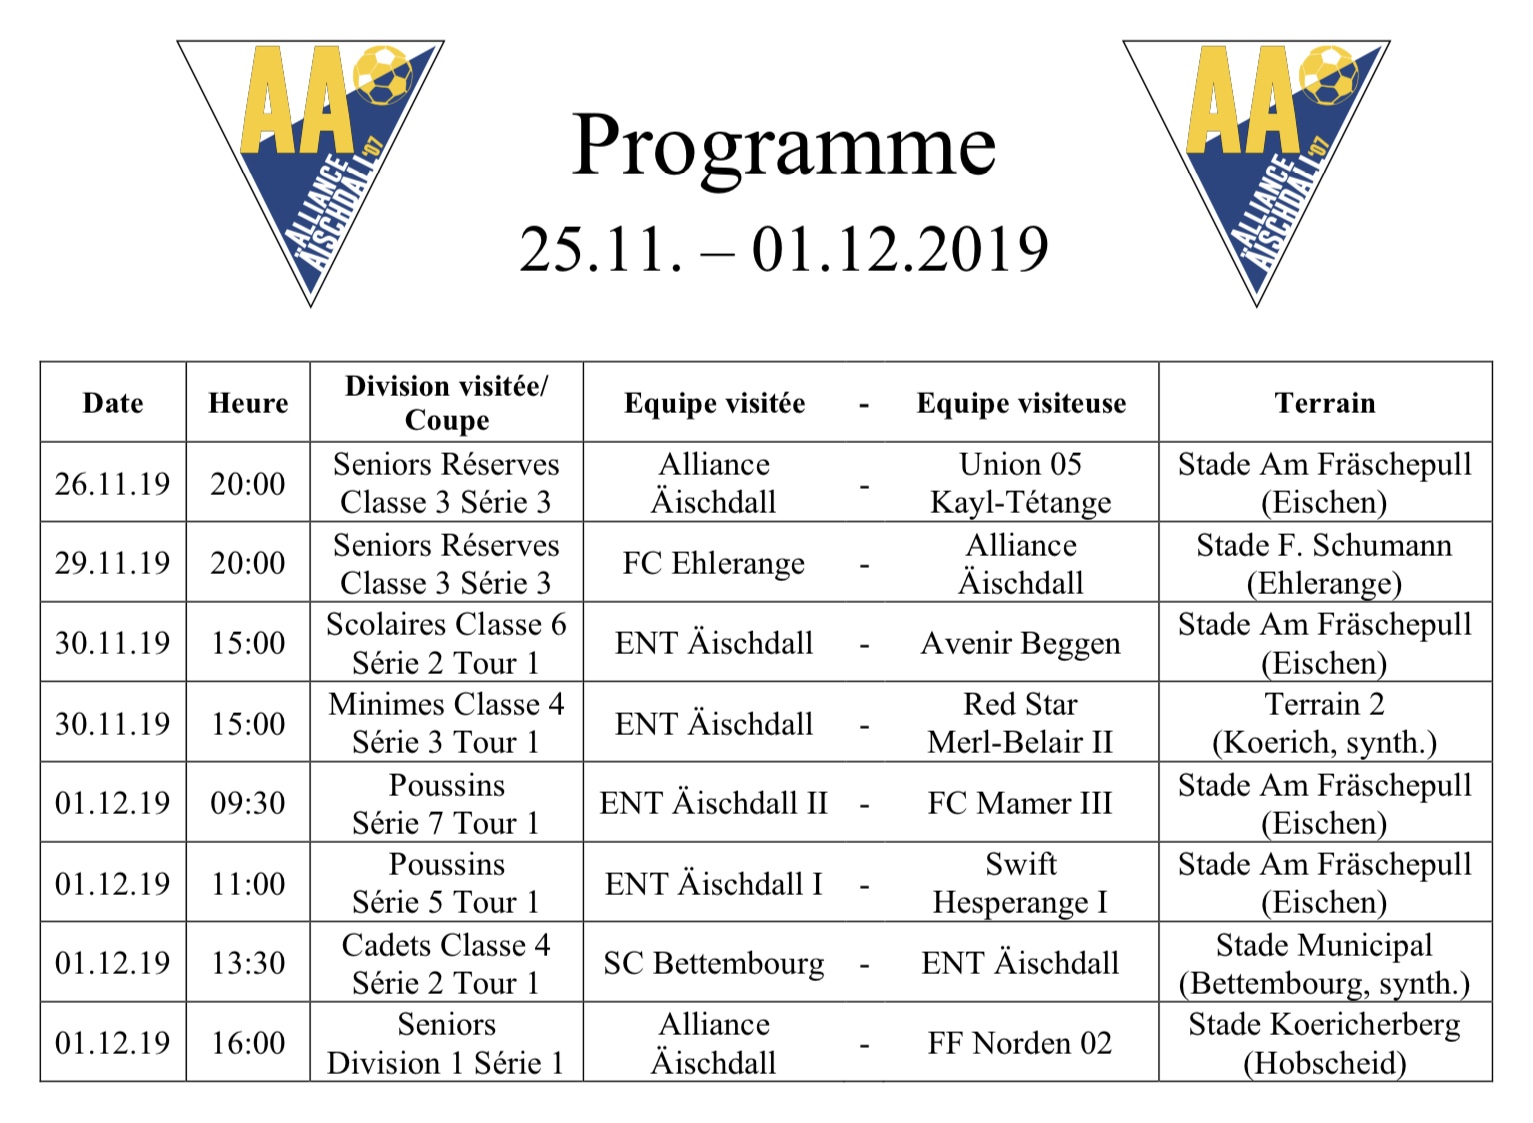 Programm 25.11.-01.12.2019